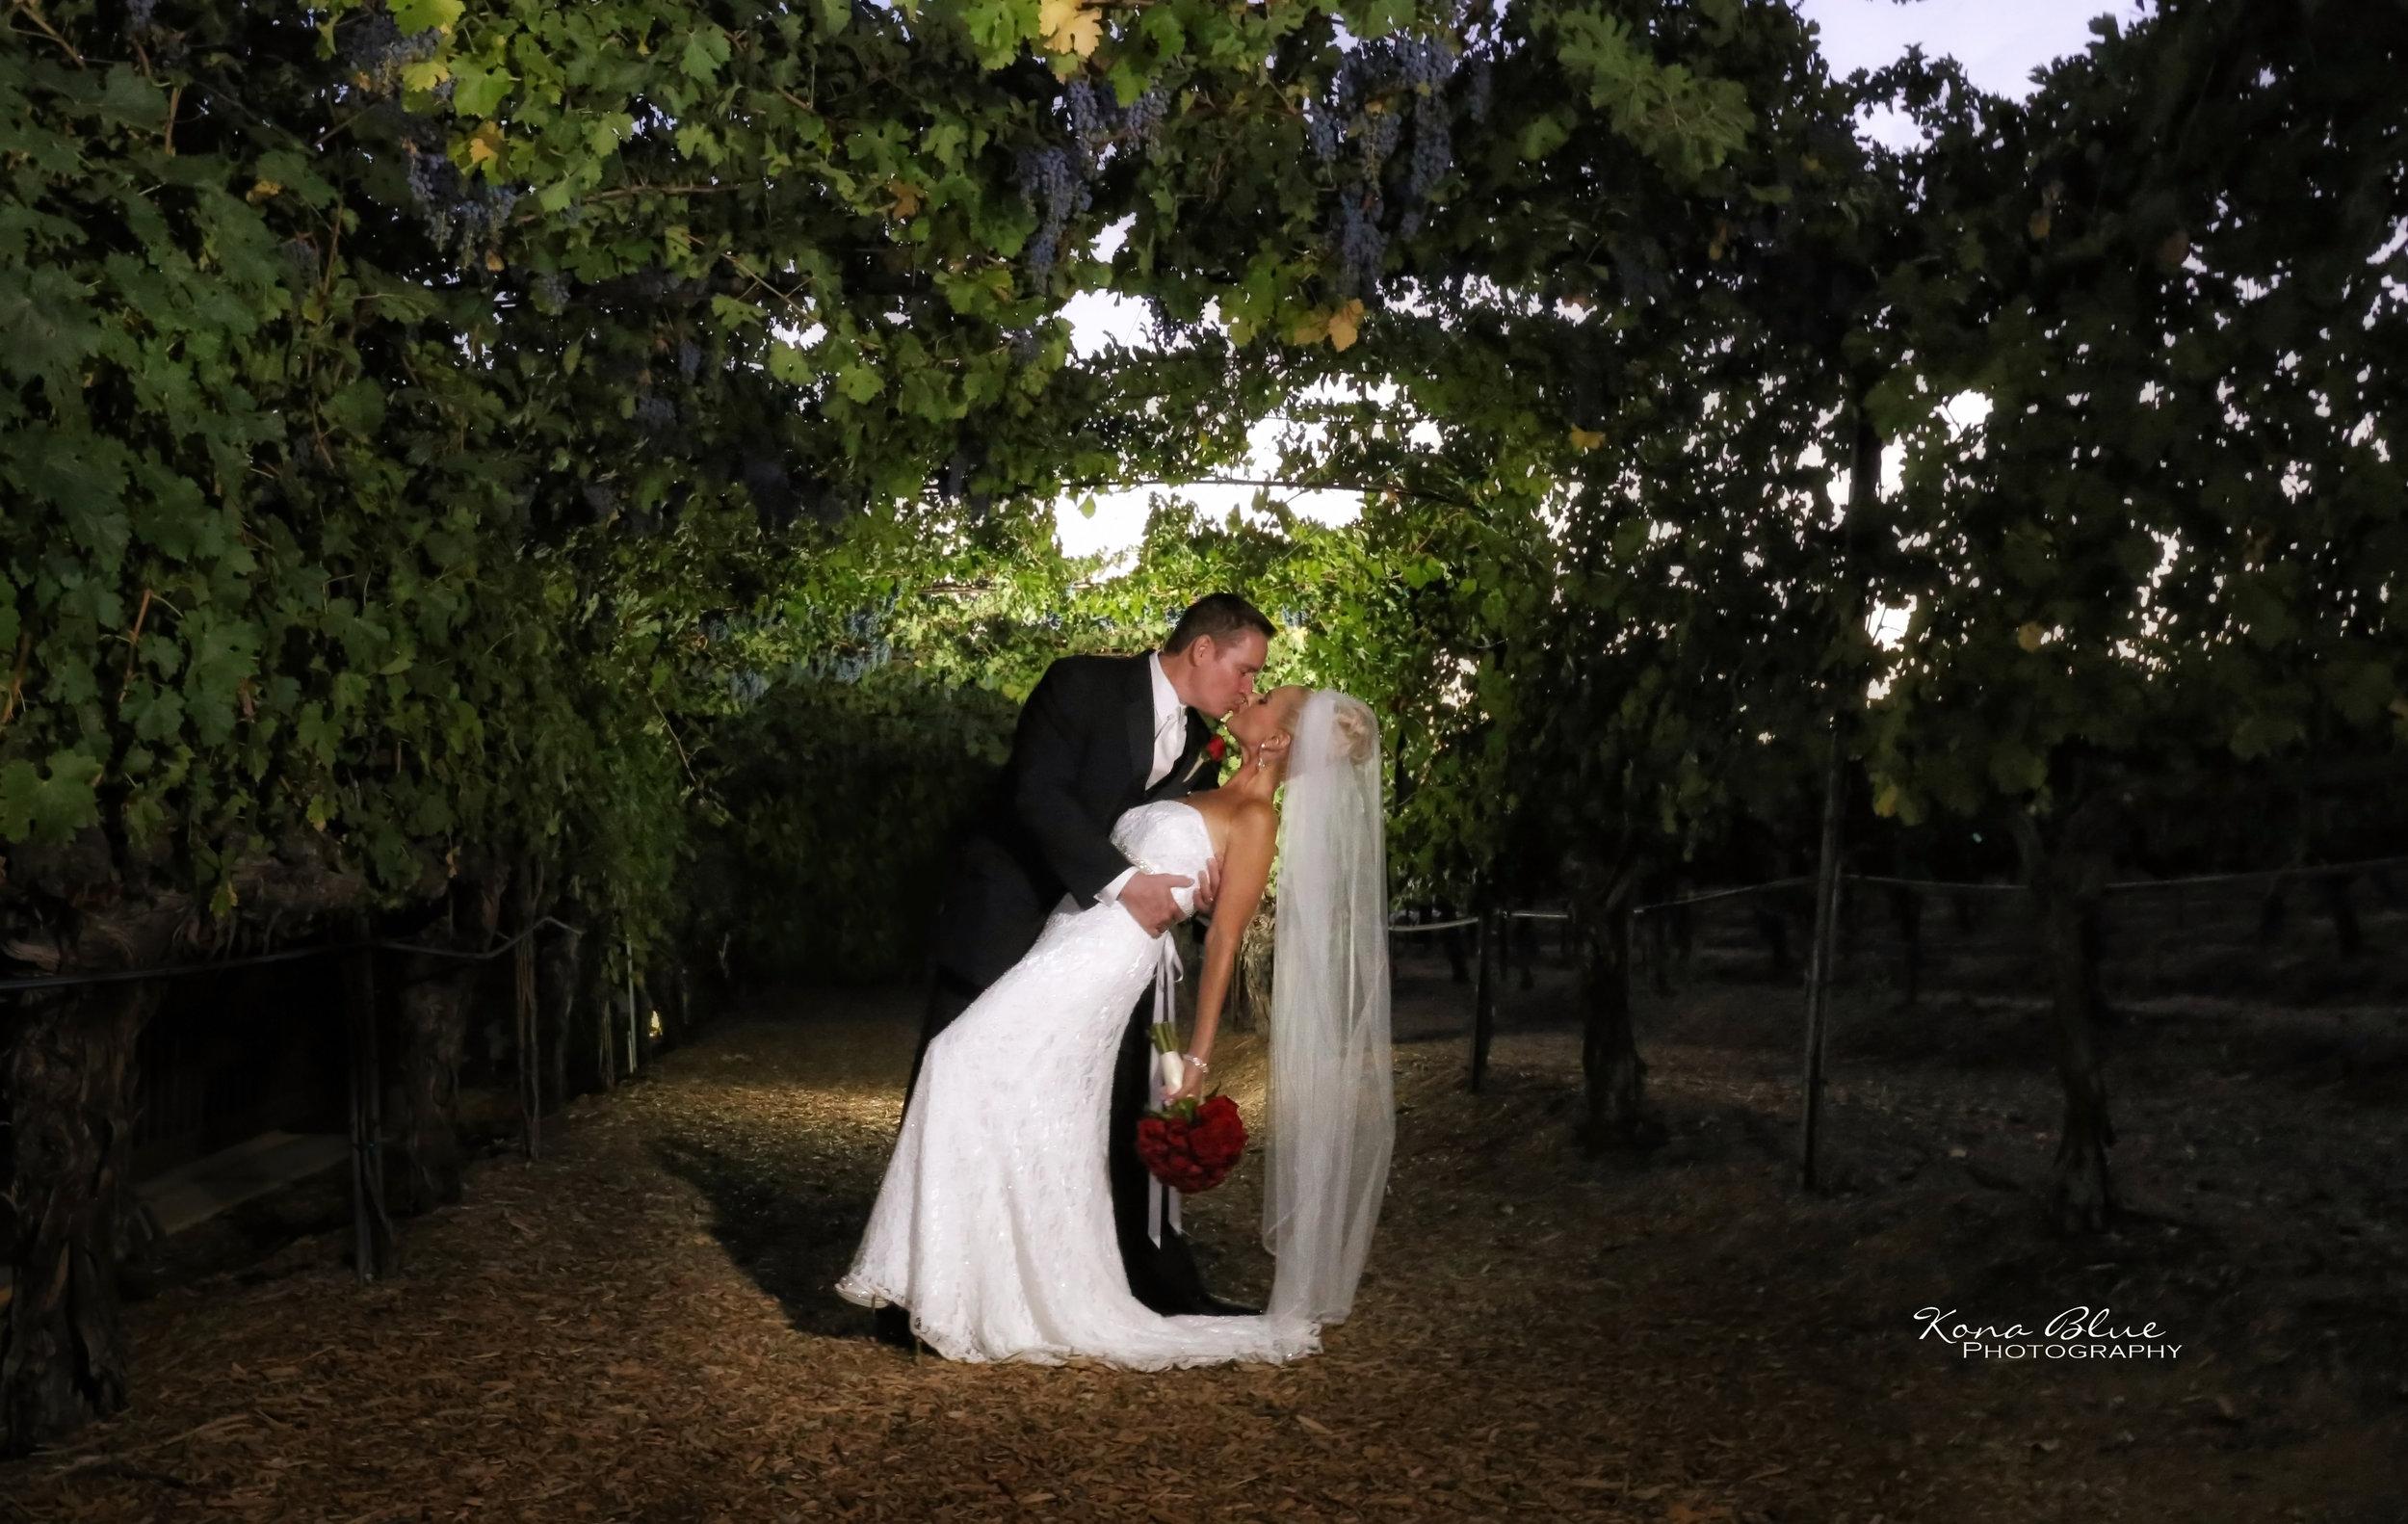 Maureen & Craigs Wedding Day (7).jpg